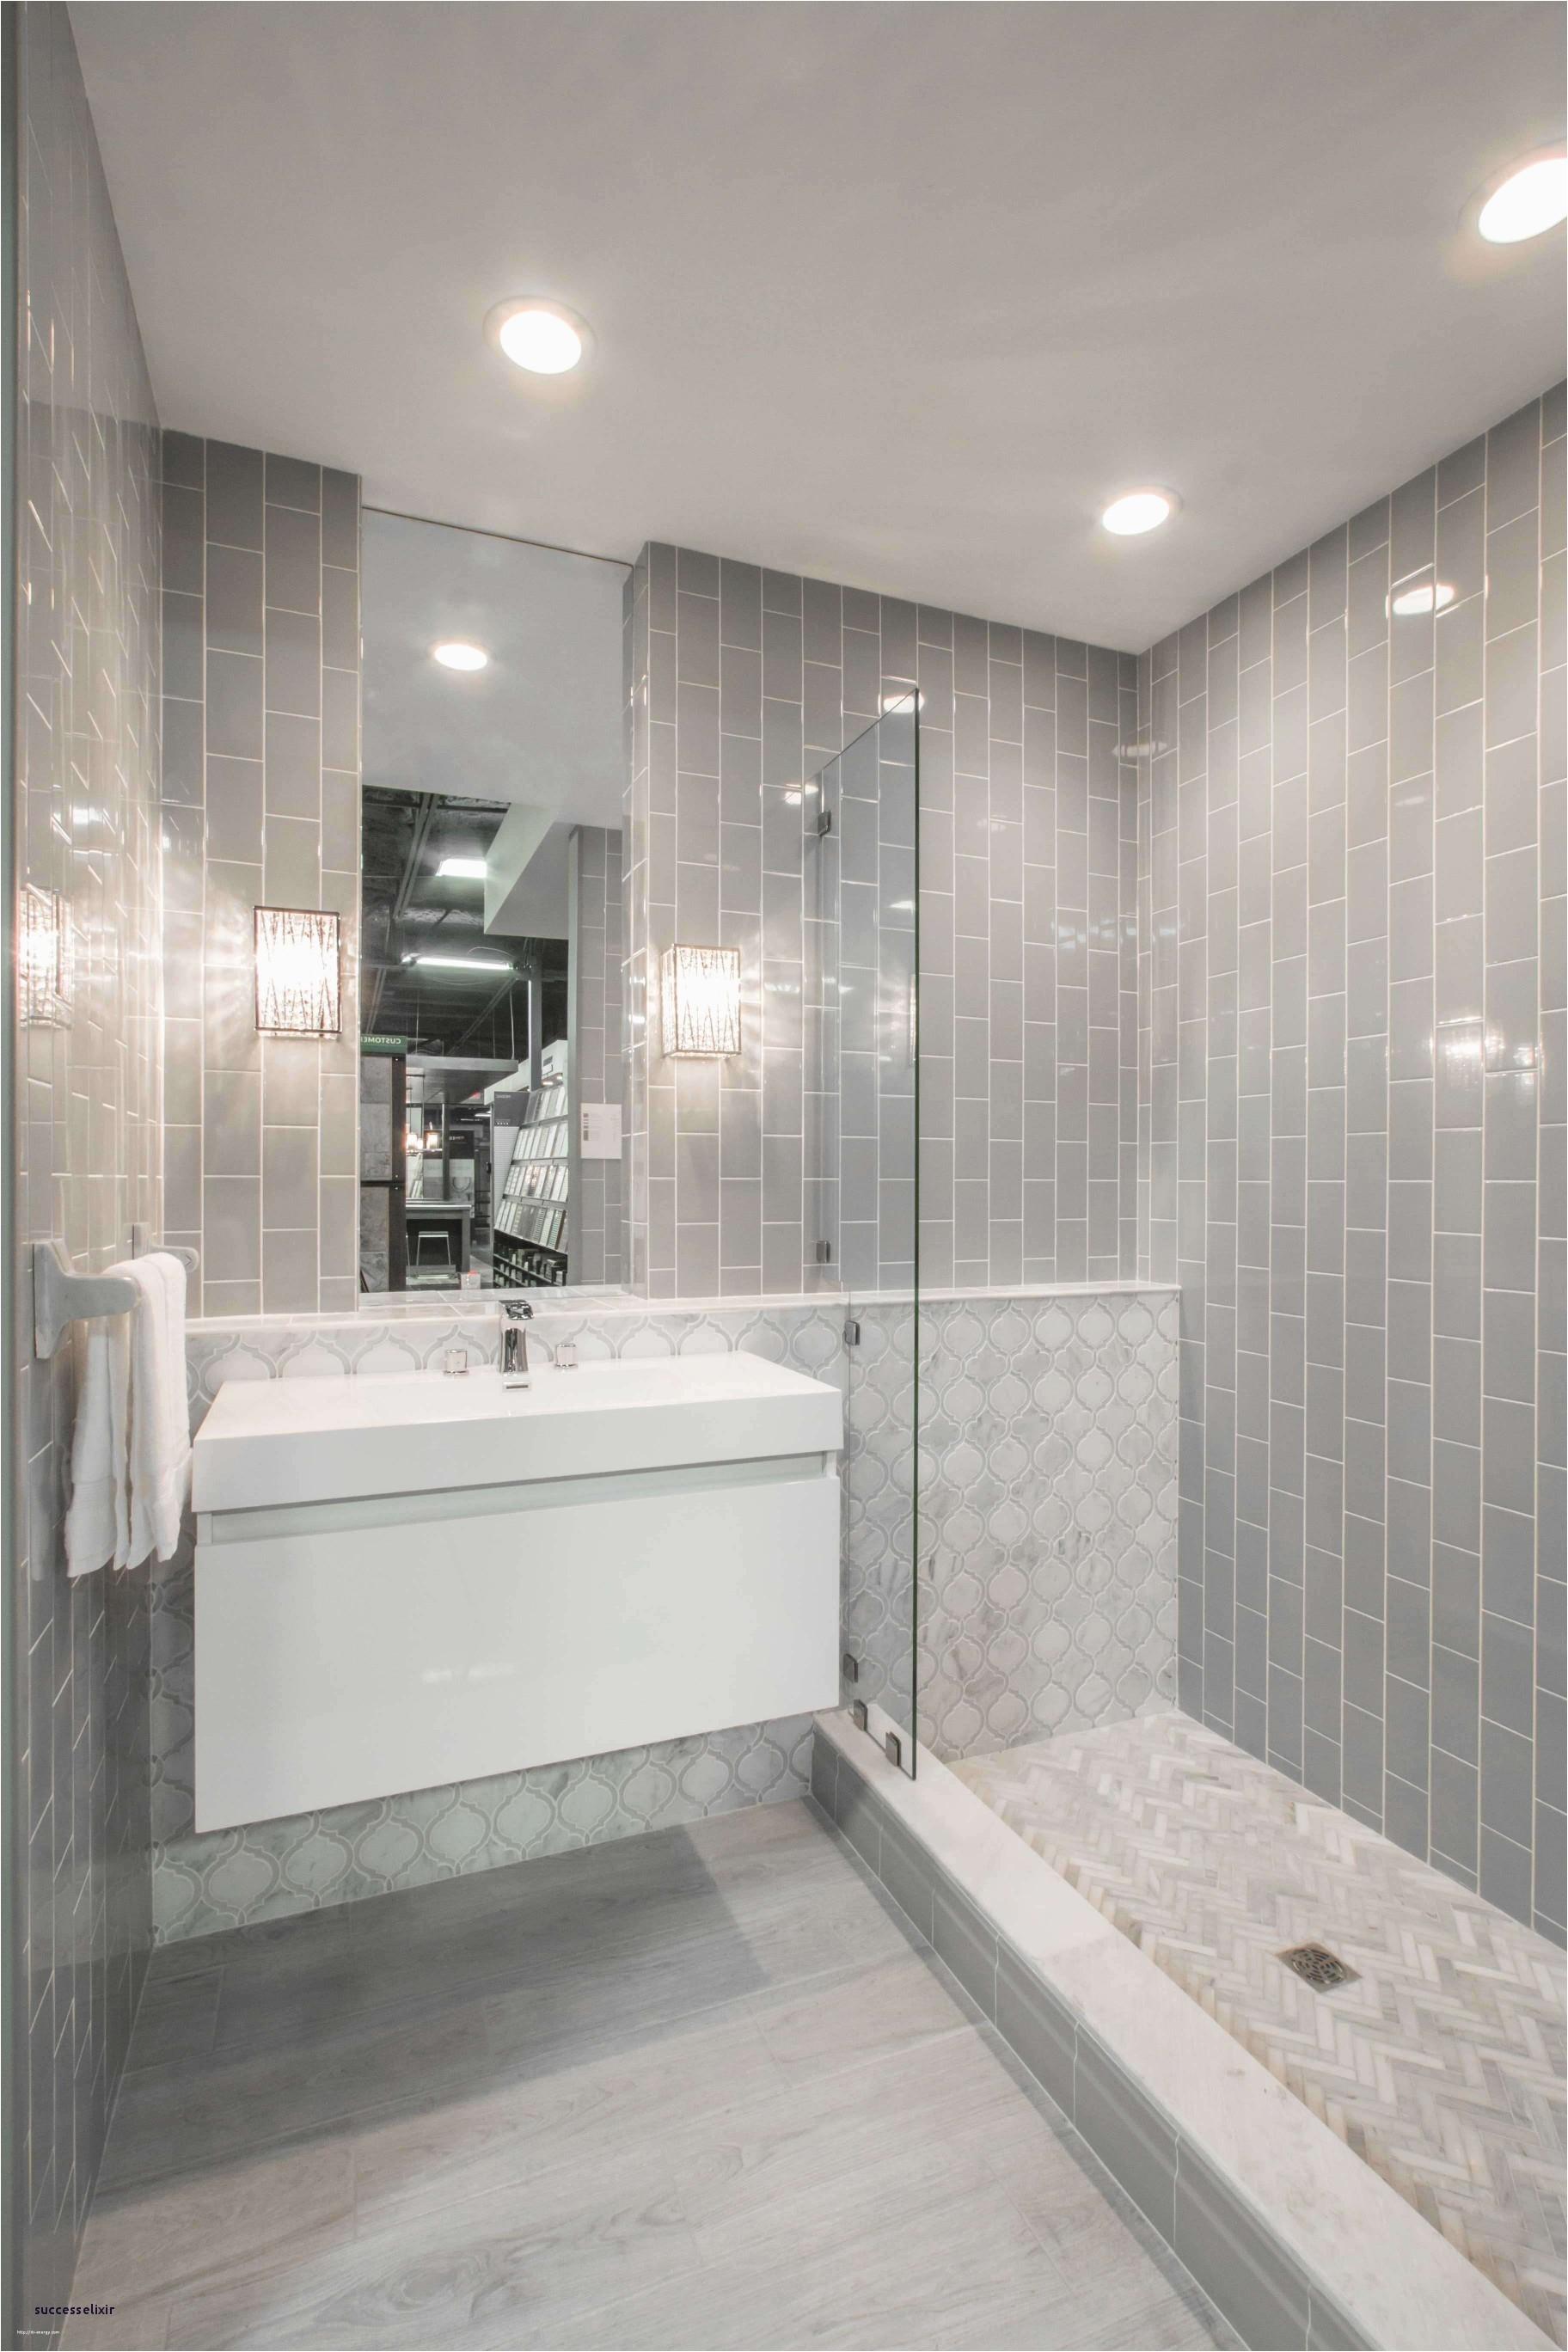 Subway Tile Bathroom Design Ideas Glass Tile Bathroom Ideas astounding 31 Glass Tile Bathroom Design